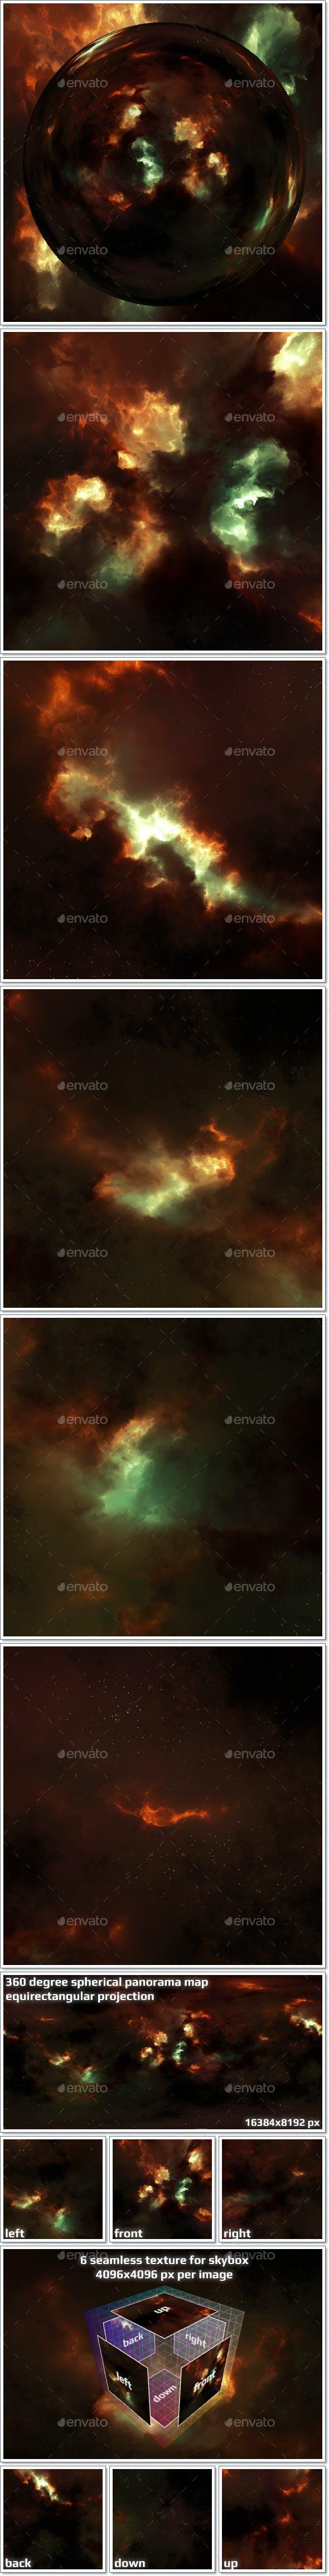 Nebula Space Environment HDRI Map 017 - 3DOcean Item for Sale